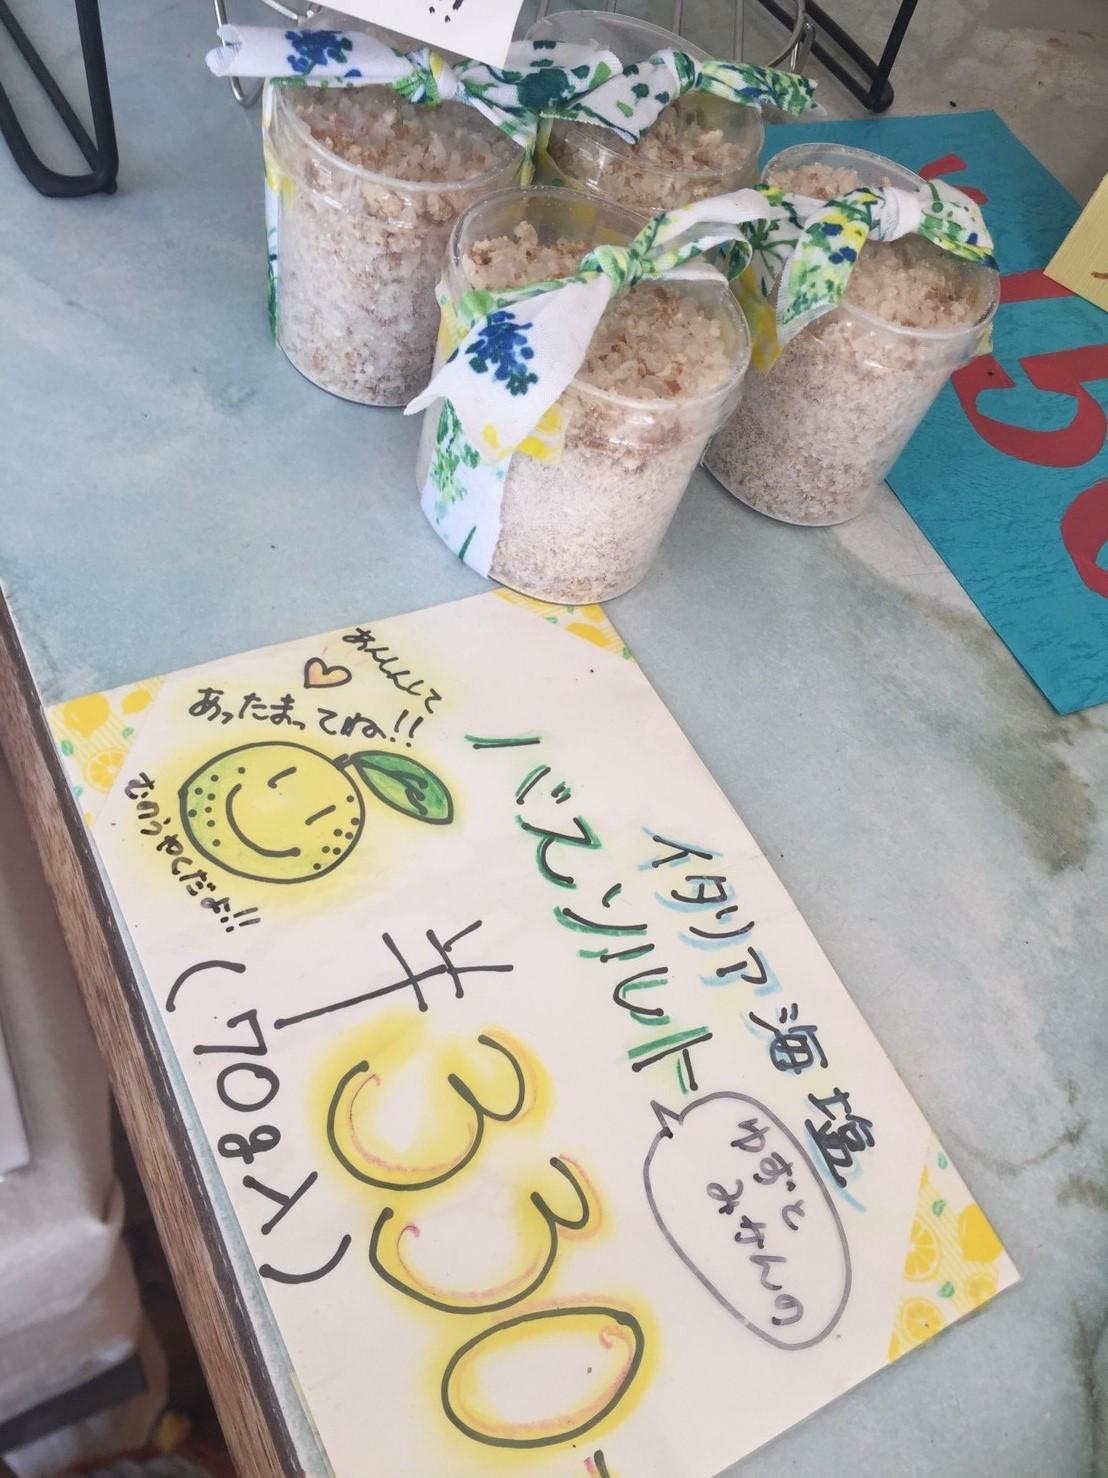 Tottori カルマ  カルマ焼飯_e0115904_22181537.jpg